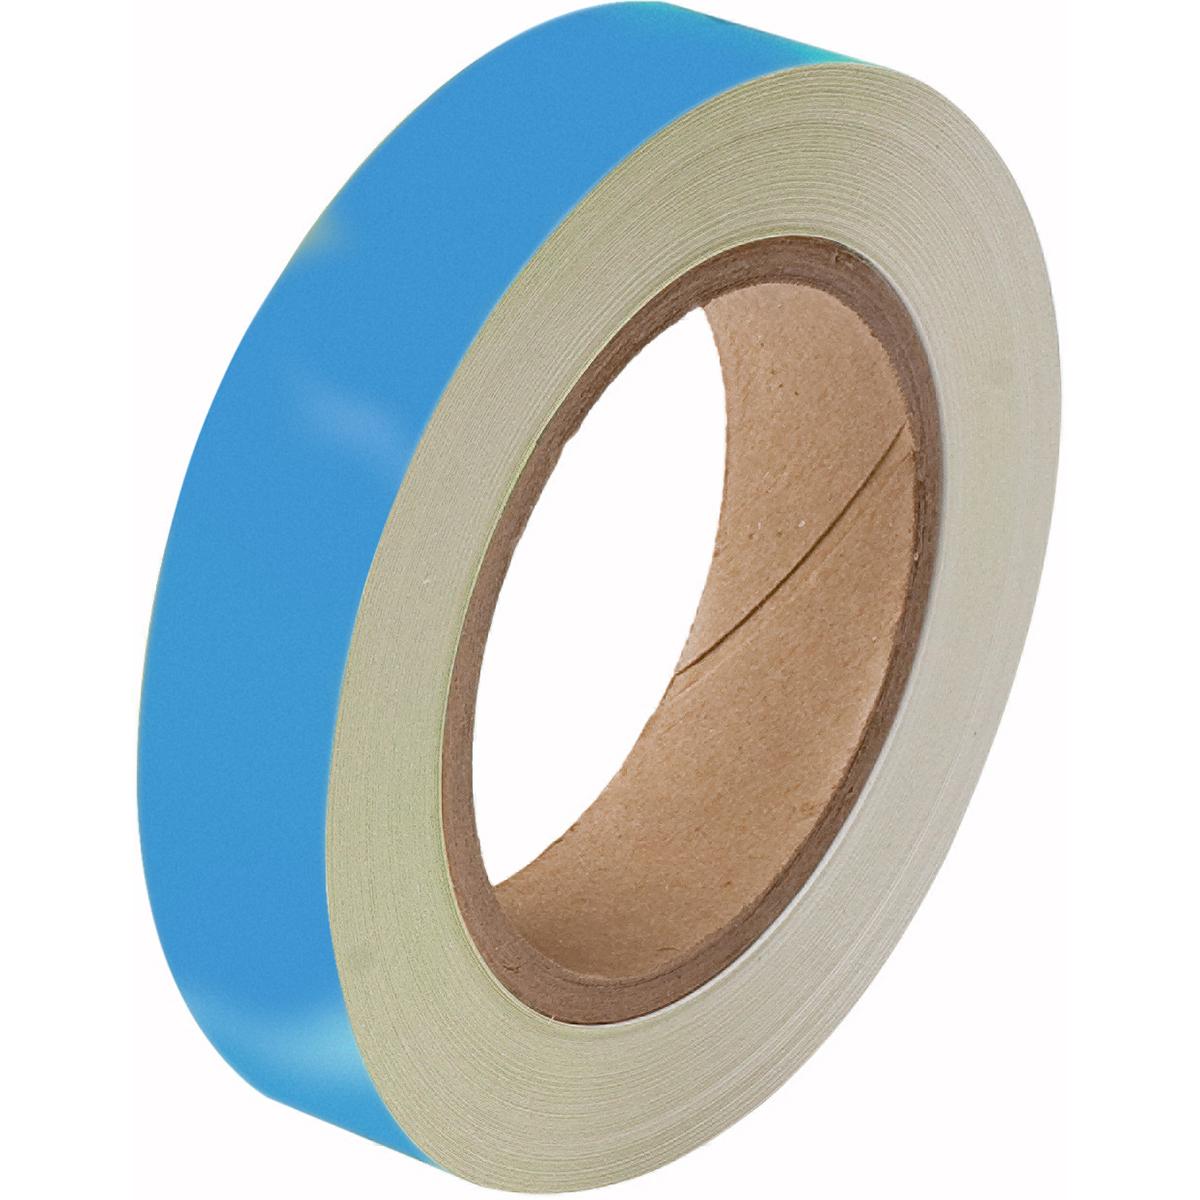 Pipe Banding Tape - Blue